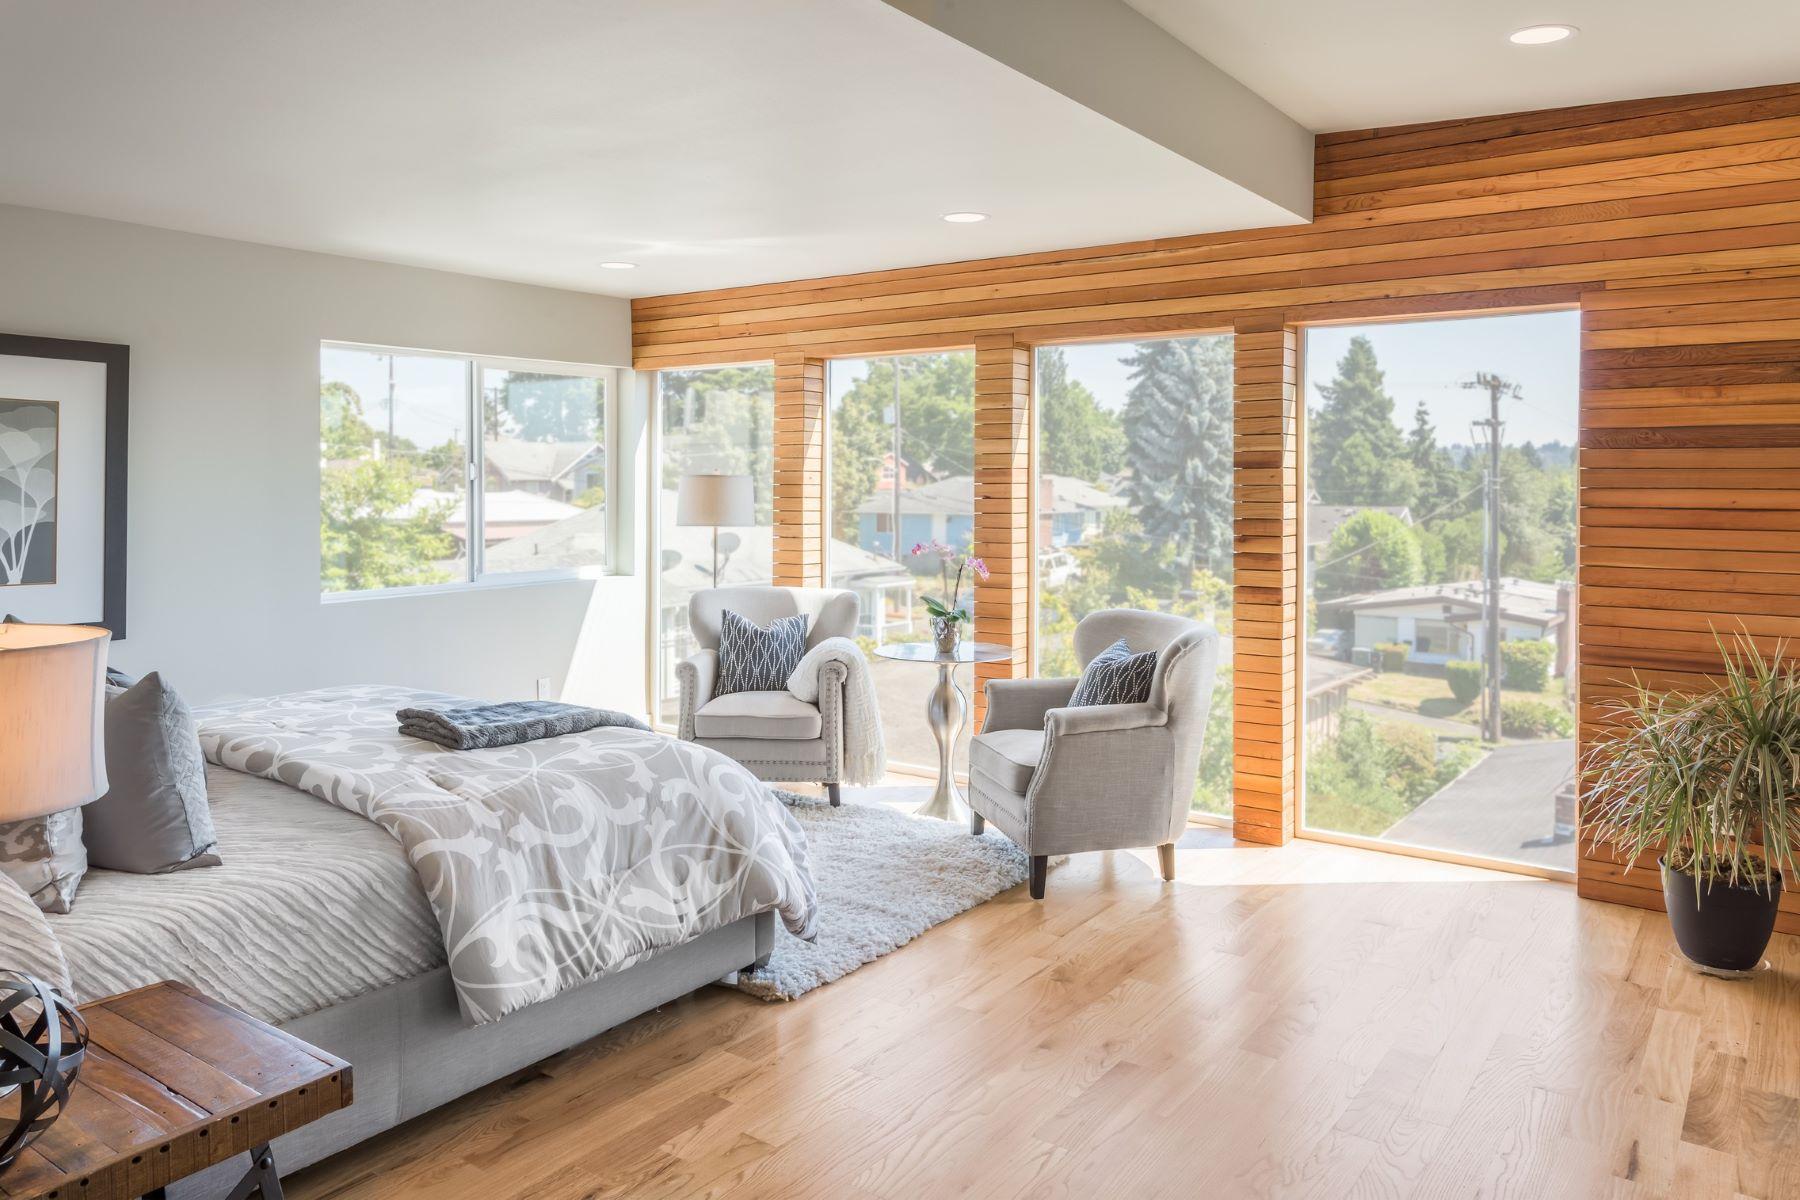 Additional photo for property listing at 5105 S Mrytle St  Seattle, Washington 98118 United States